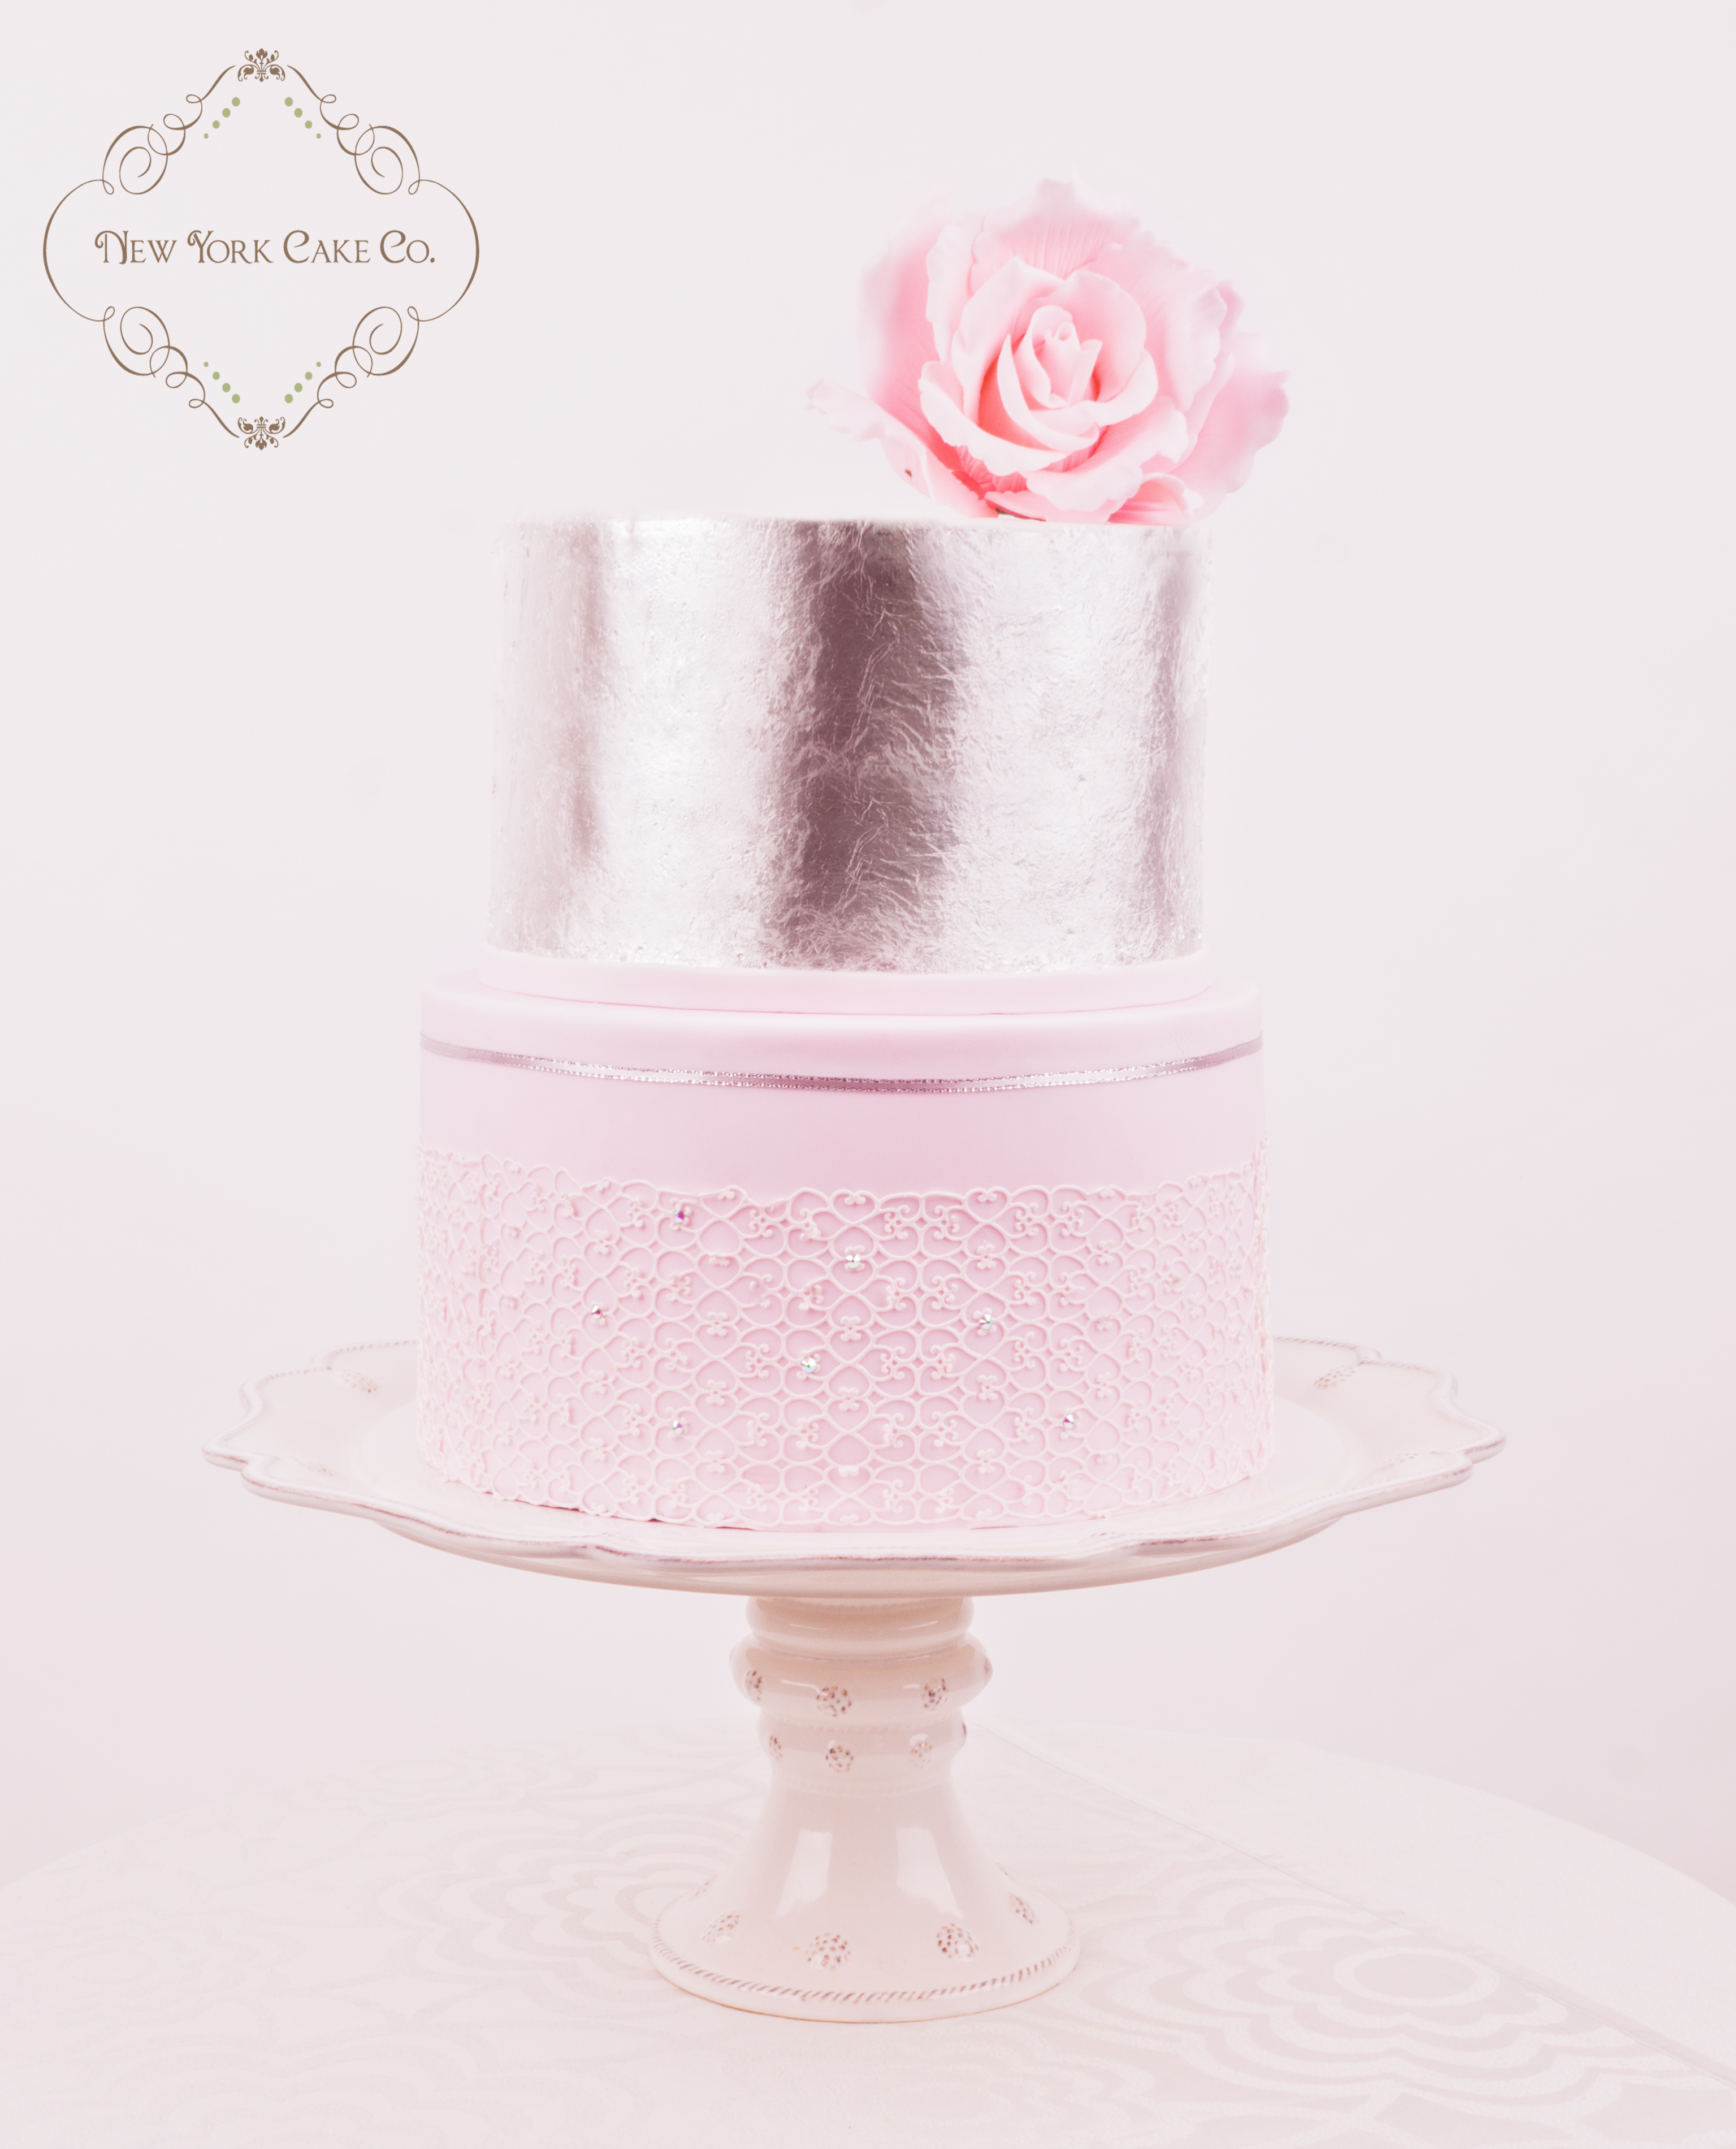 wedding | New York Cake Co.